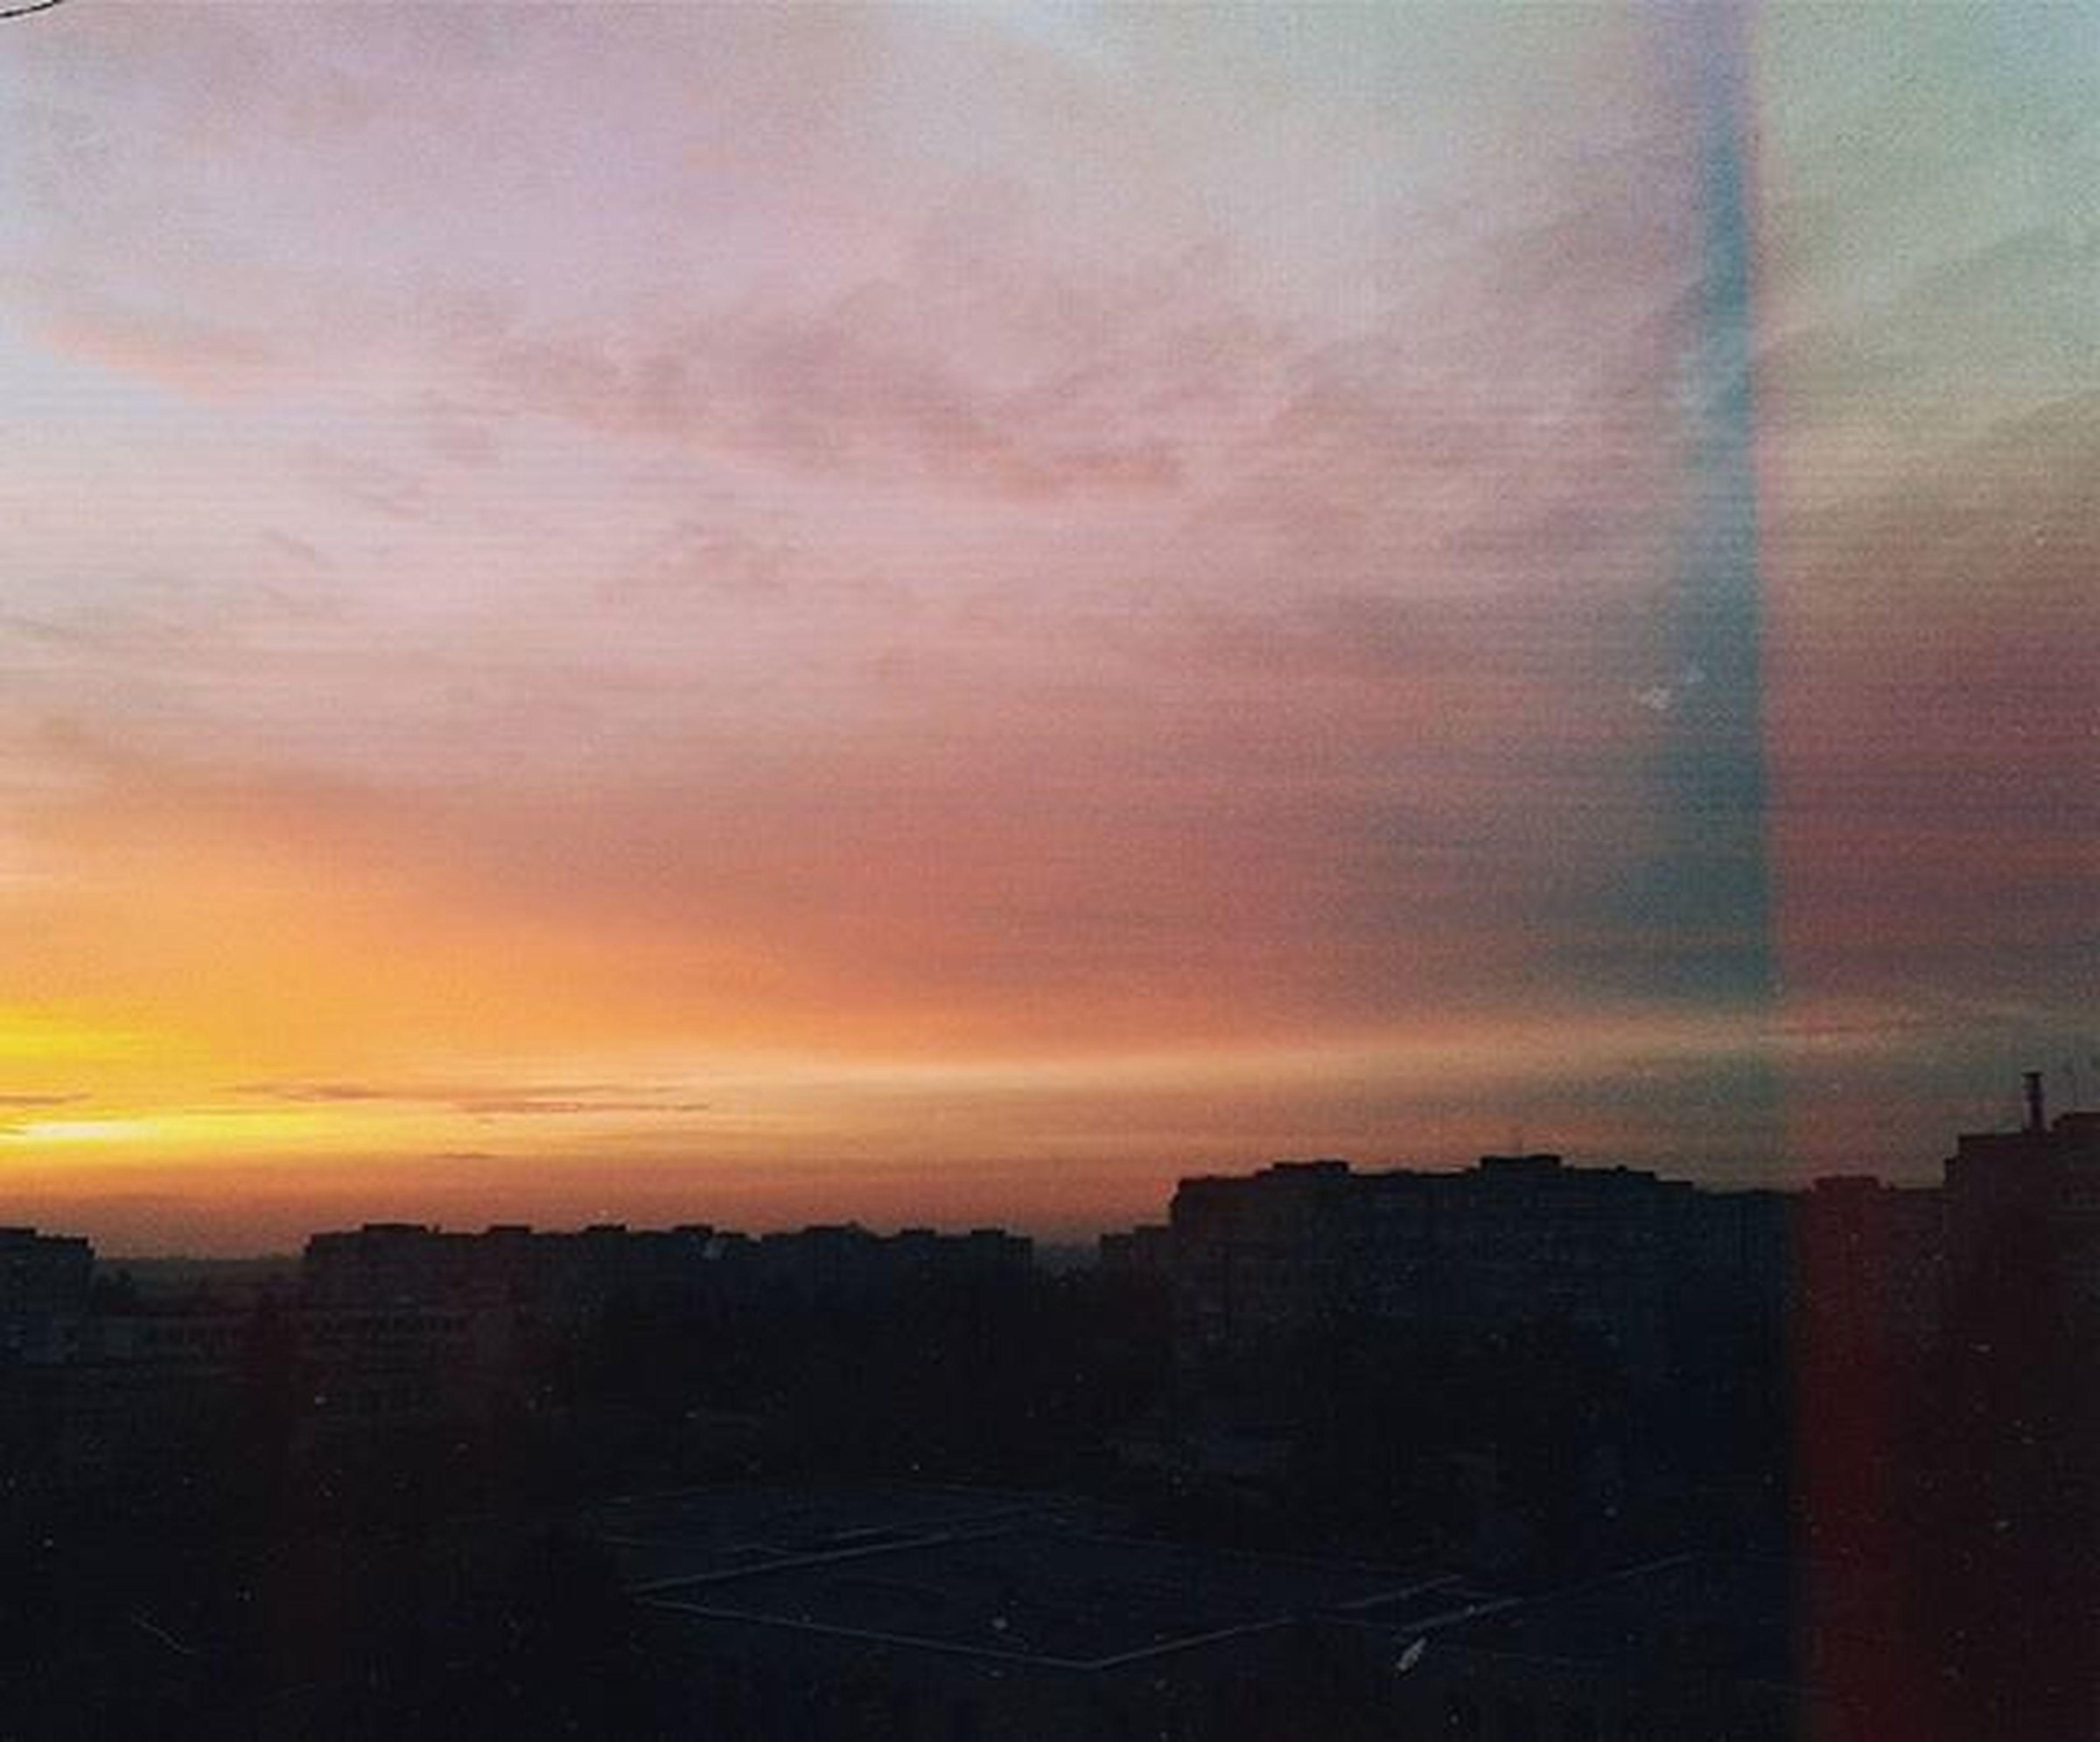 sunset, building exterior, architecture, built structure, city, cityscape, orange color, sky, silhouette, residential building, cloud - sky, residential structure, residential district, building, no people, outdoors, skyscraper, cloud, crowded, nature